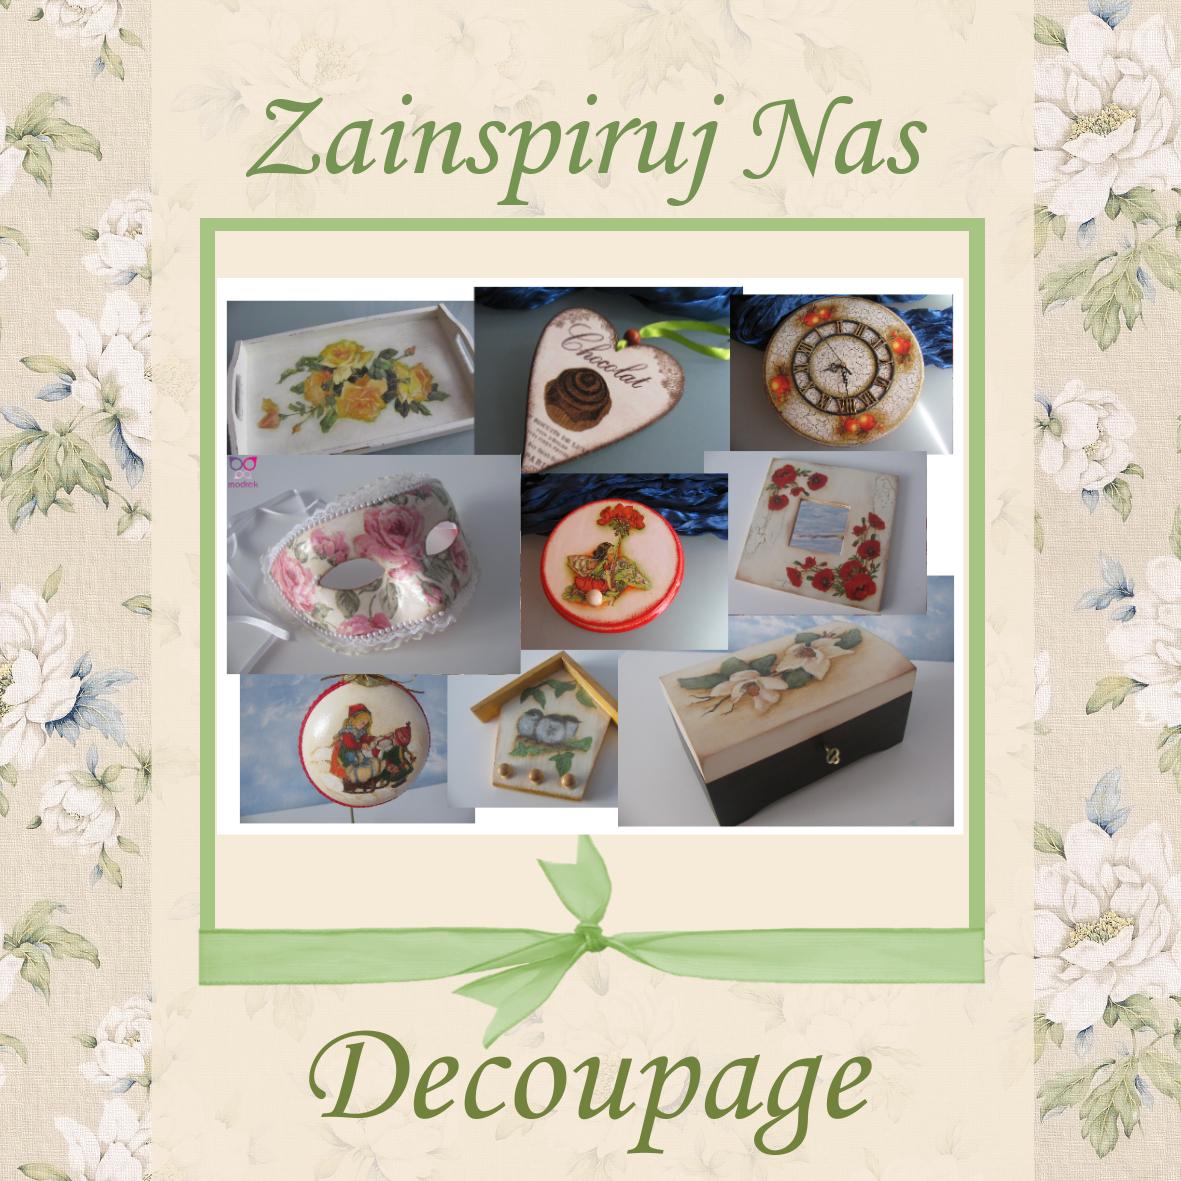 http://szuflada-szuflada.blogspot.com/2014/03/zainspiruj-nas-decoupage.html